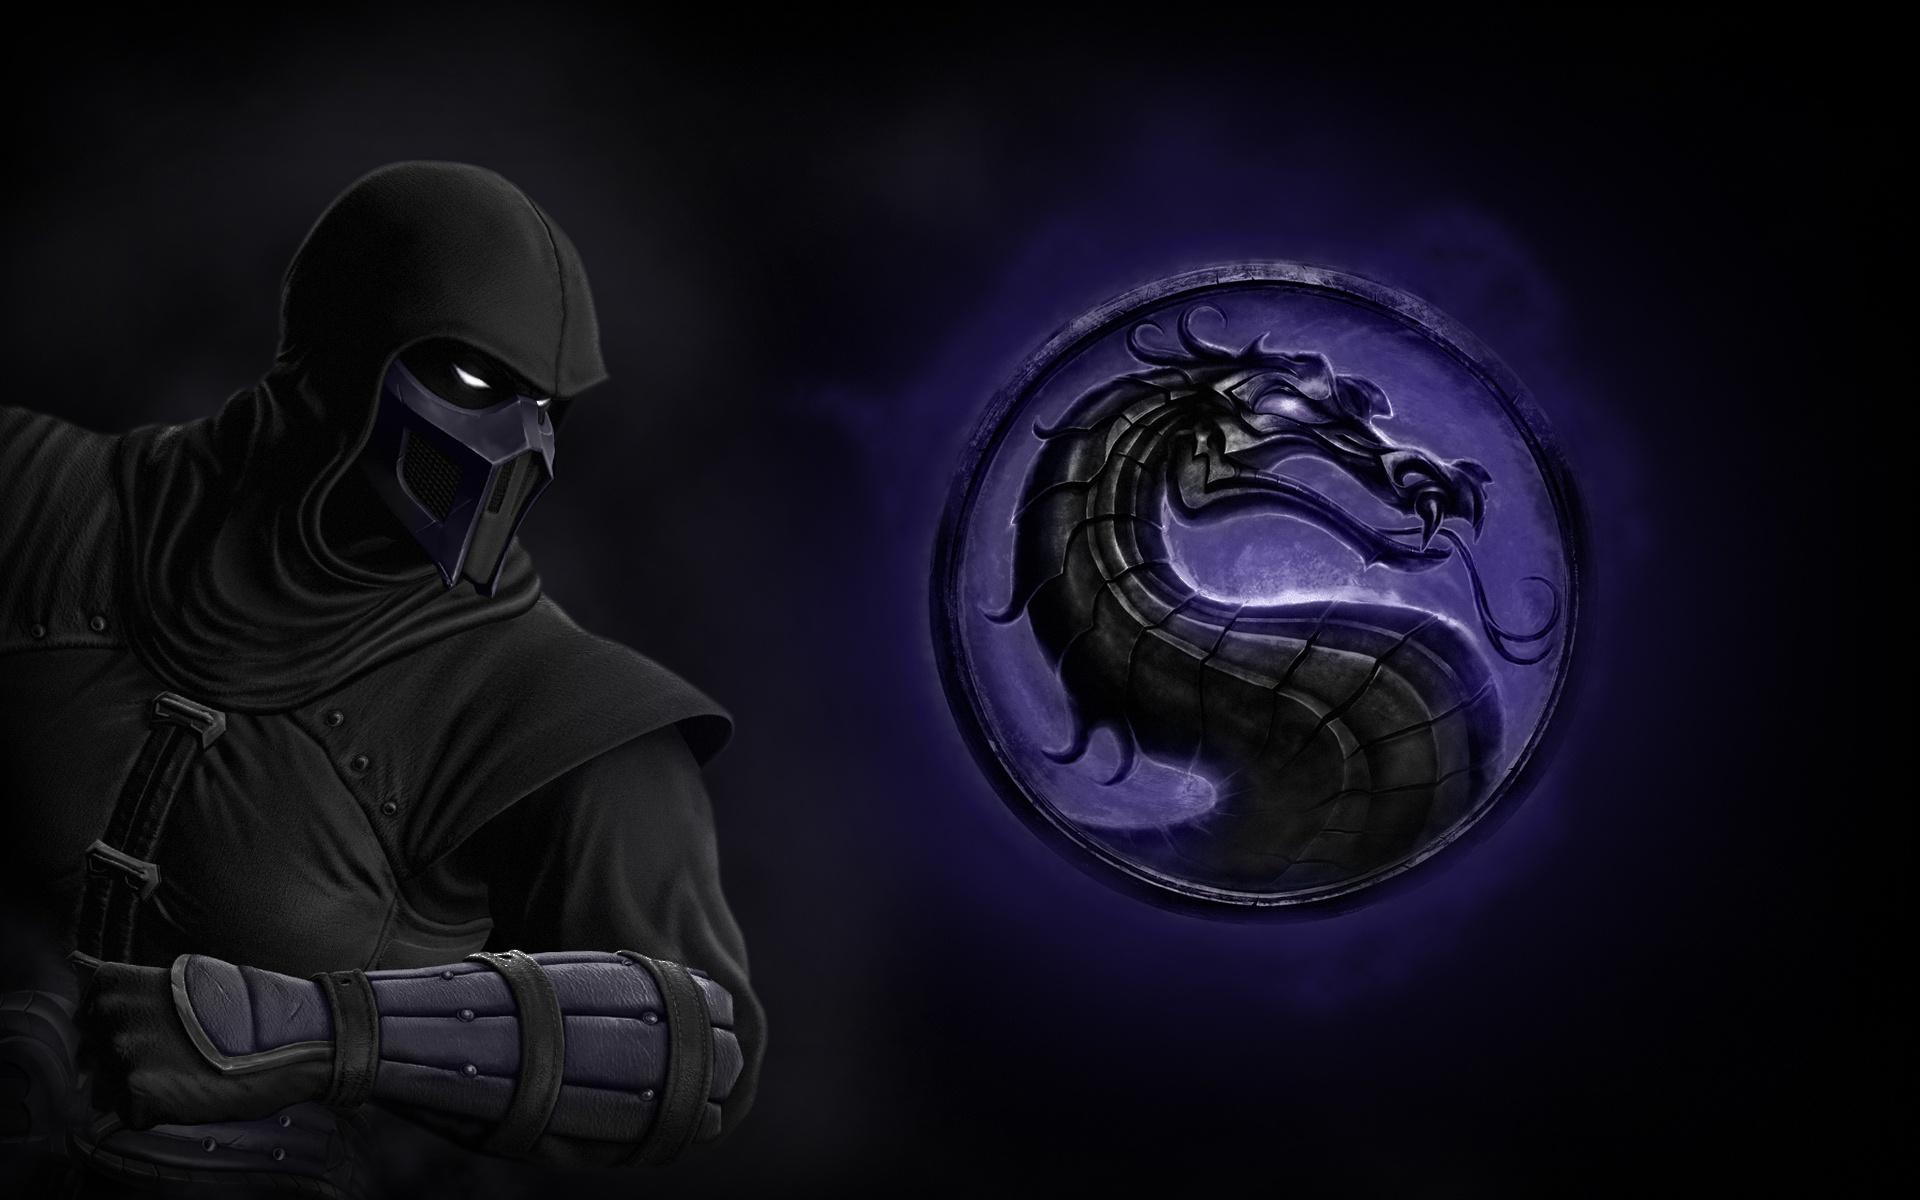 Mortal Kombat Wallpapers Mortal Kombat Backgrounds Mortal Kombat 1920x1200